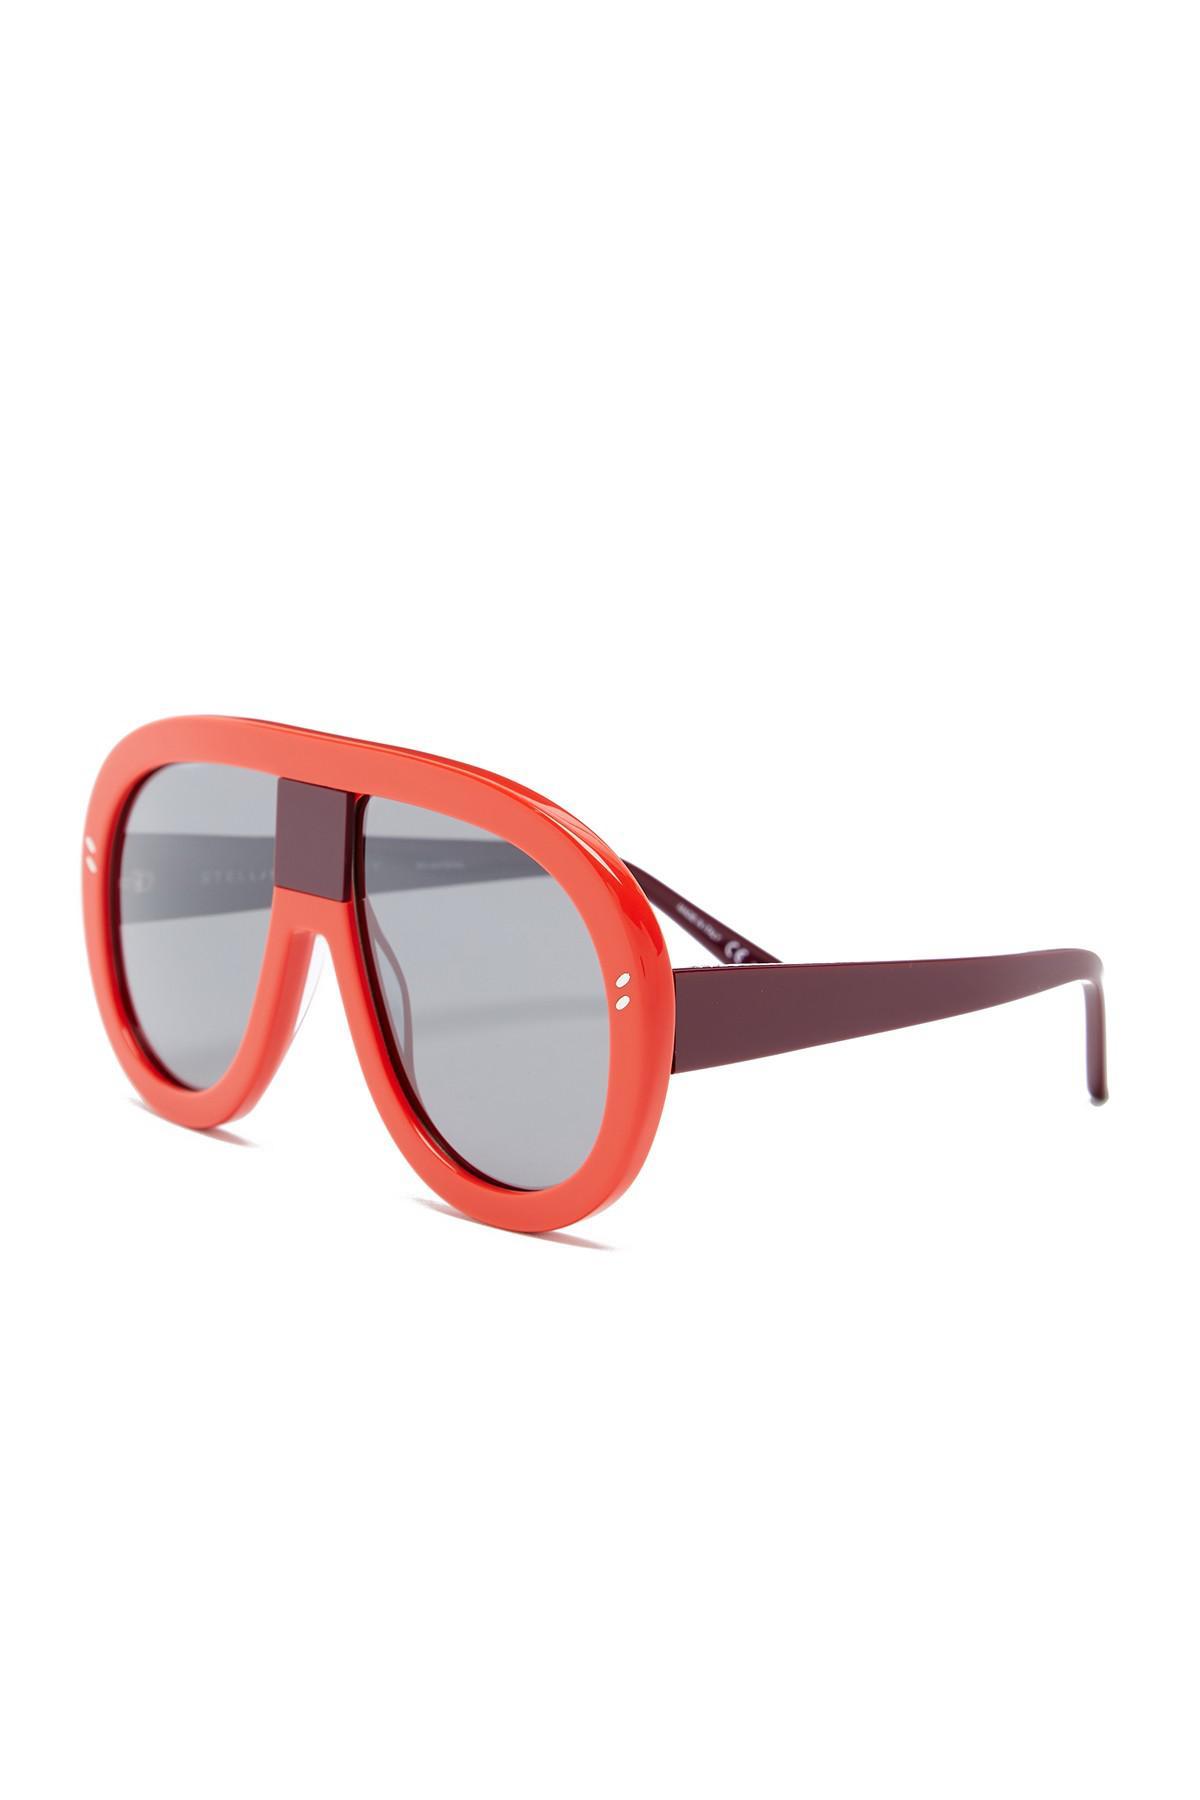 1390580b973 Lyst - Stella McCartney 60mm Aviator Sunglasses in Red